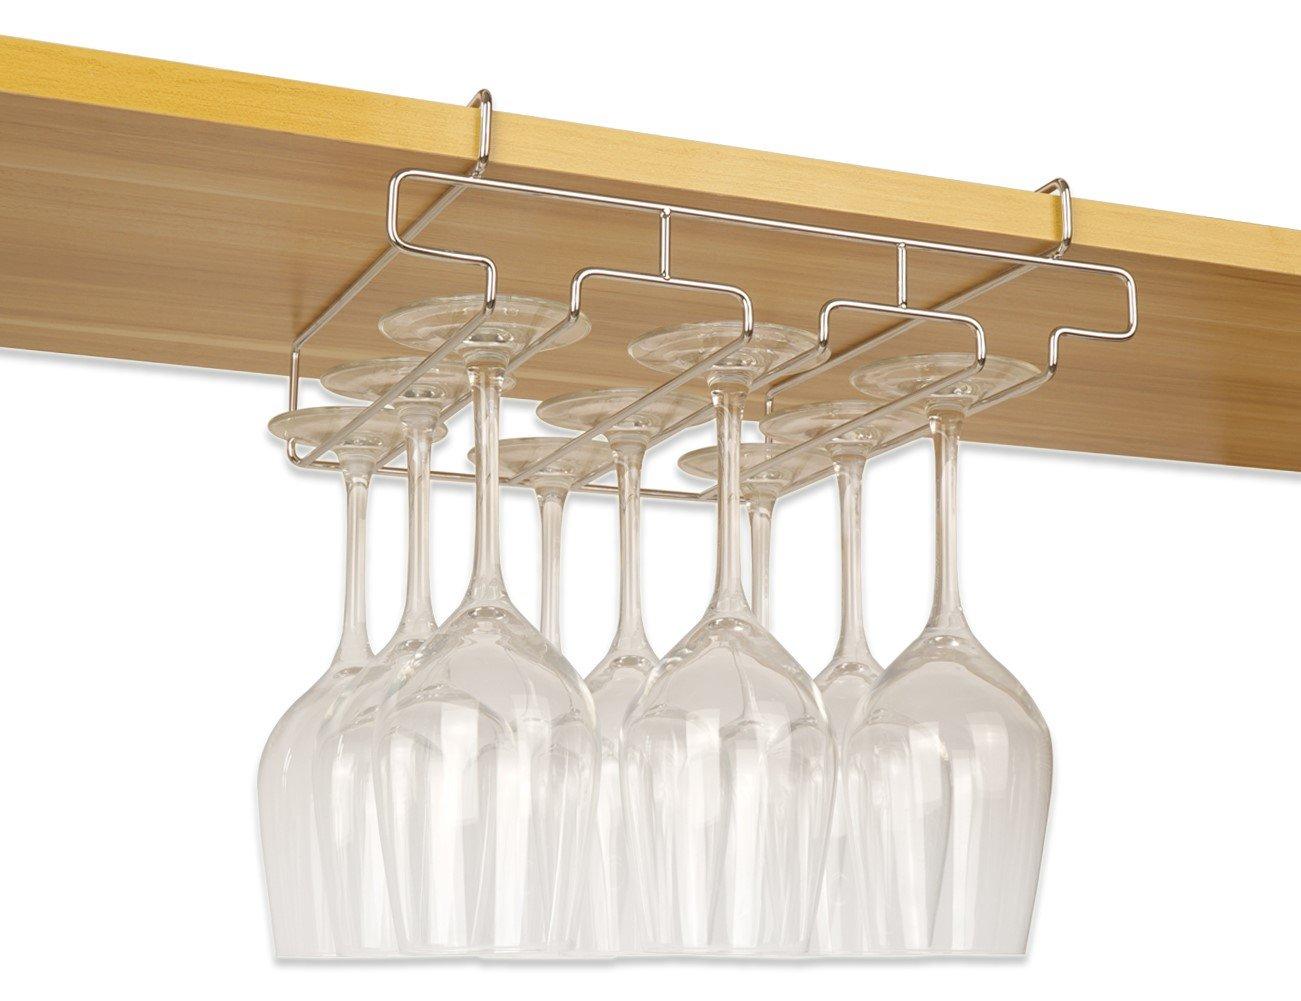 "Bafvt Wine Glass Holder - 3 Rows Stemware Rack Under Cabinet - 304 Stainless Steel Hanger Storage Shelf, Fit for The Cabinet 0.9"" or Less"